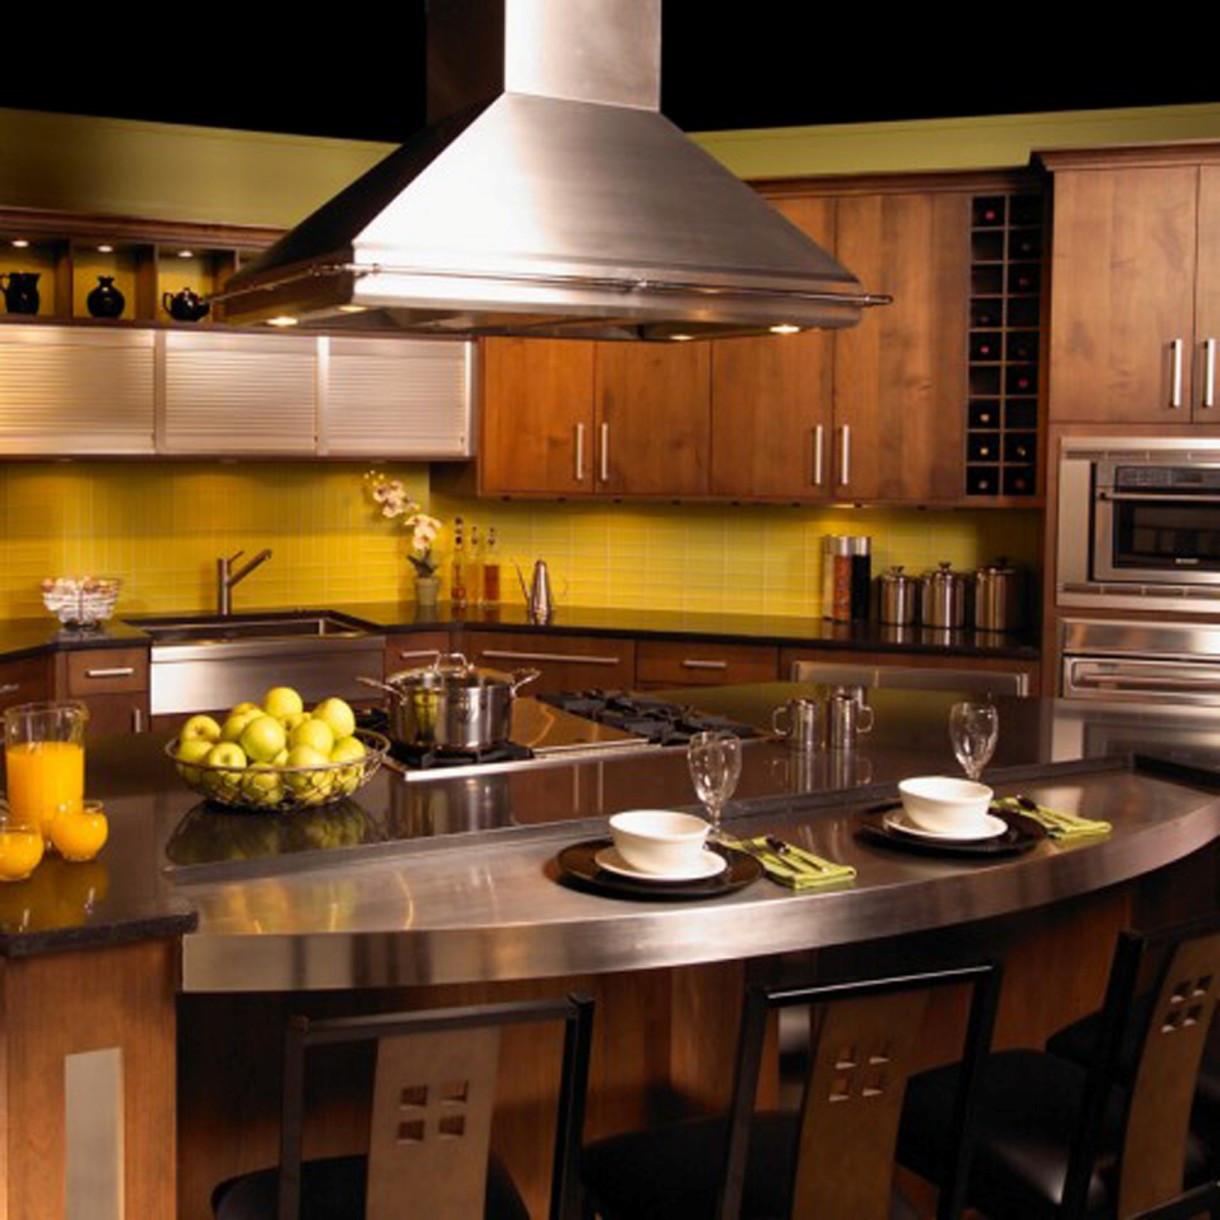 Best ideas about Kitchen Decoration Image . Save or Pin 21 Marvelous Italian Kitchen Decor Ideas Now.